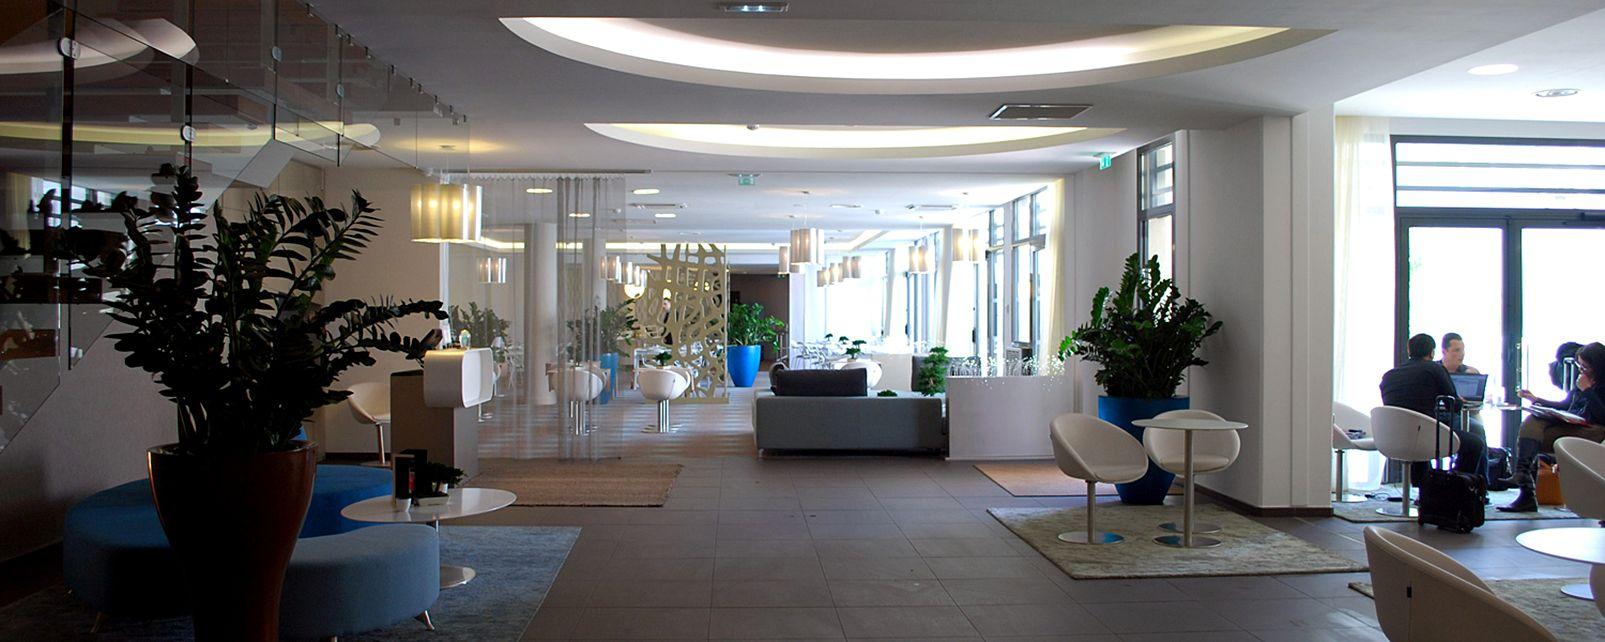 Hôtel Novotel Avignon Centre